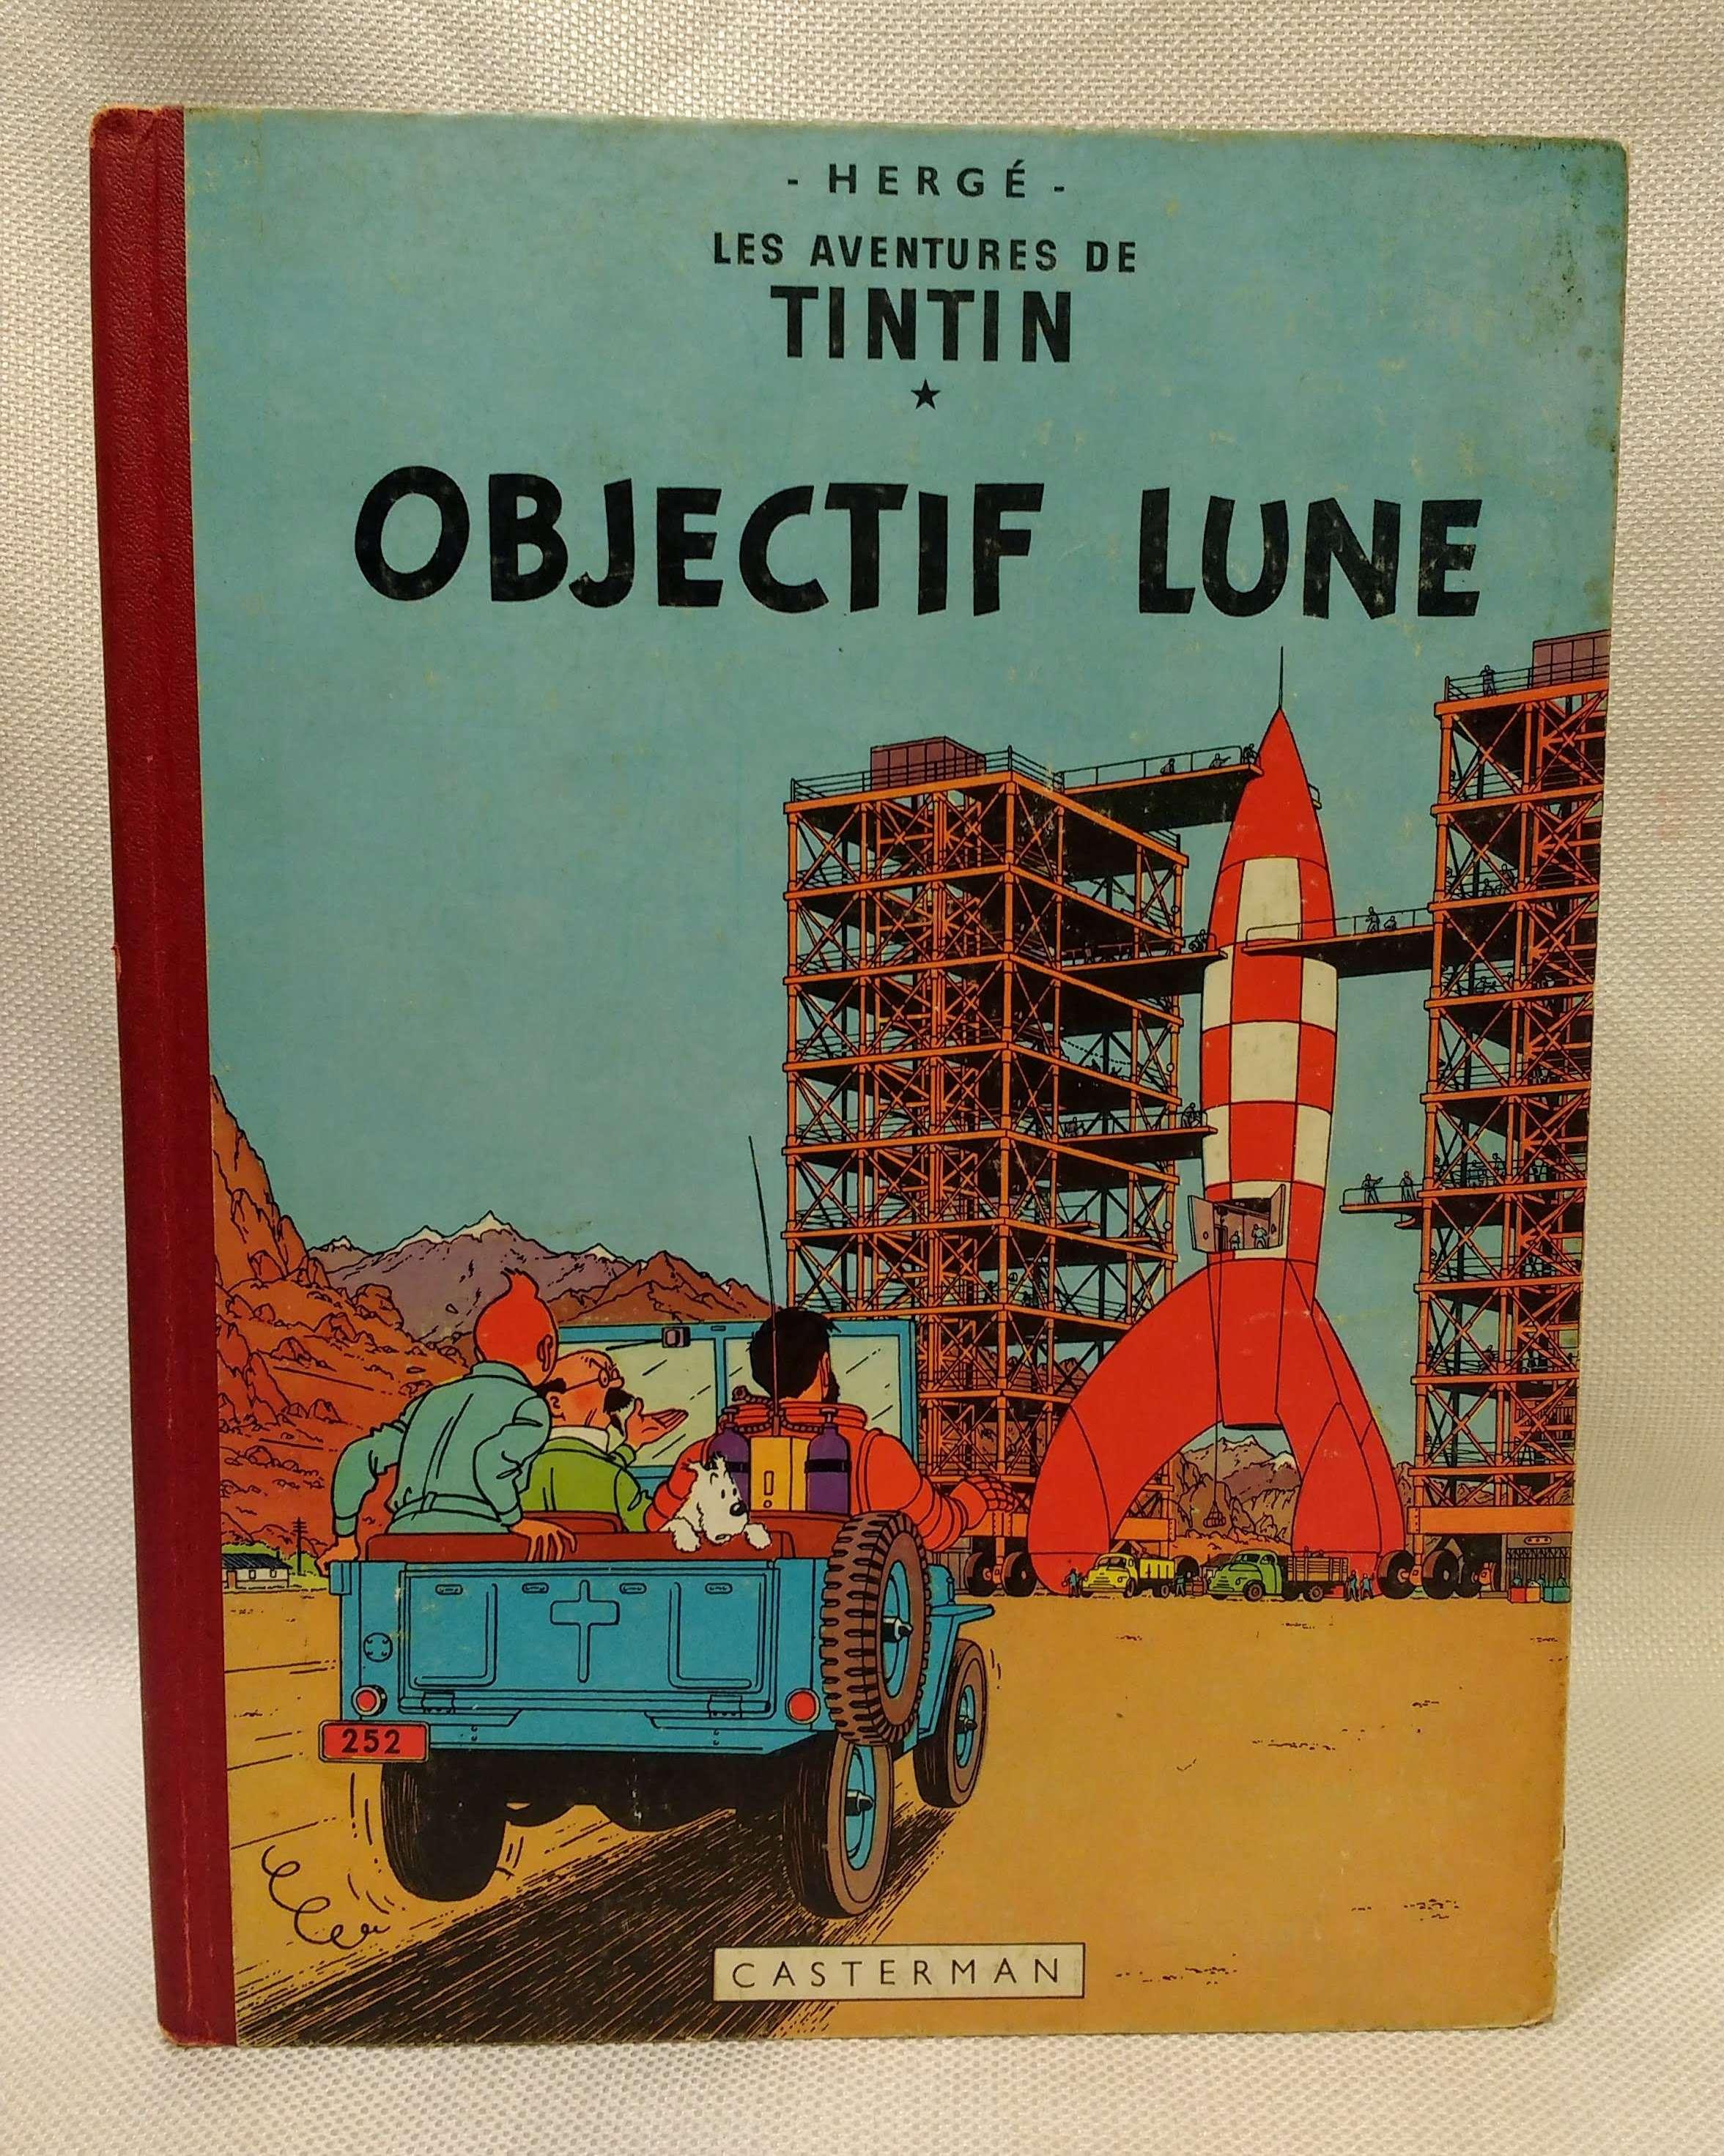 Les Adventures de Tintin: Objectif Lune, Herge